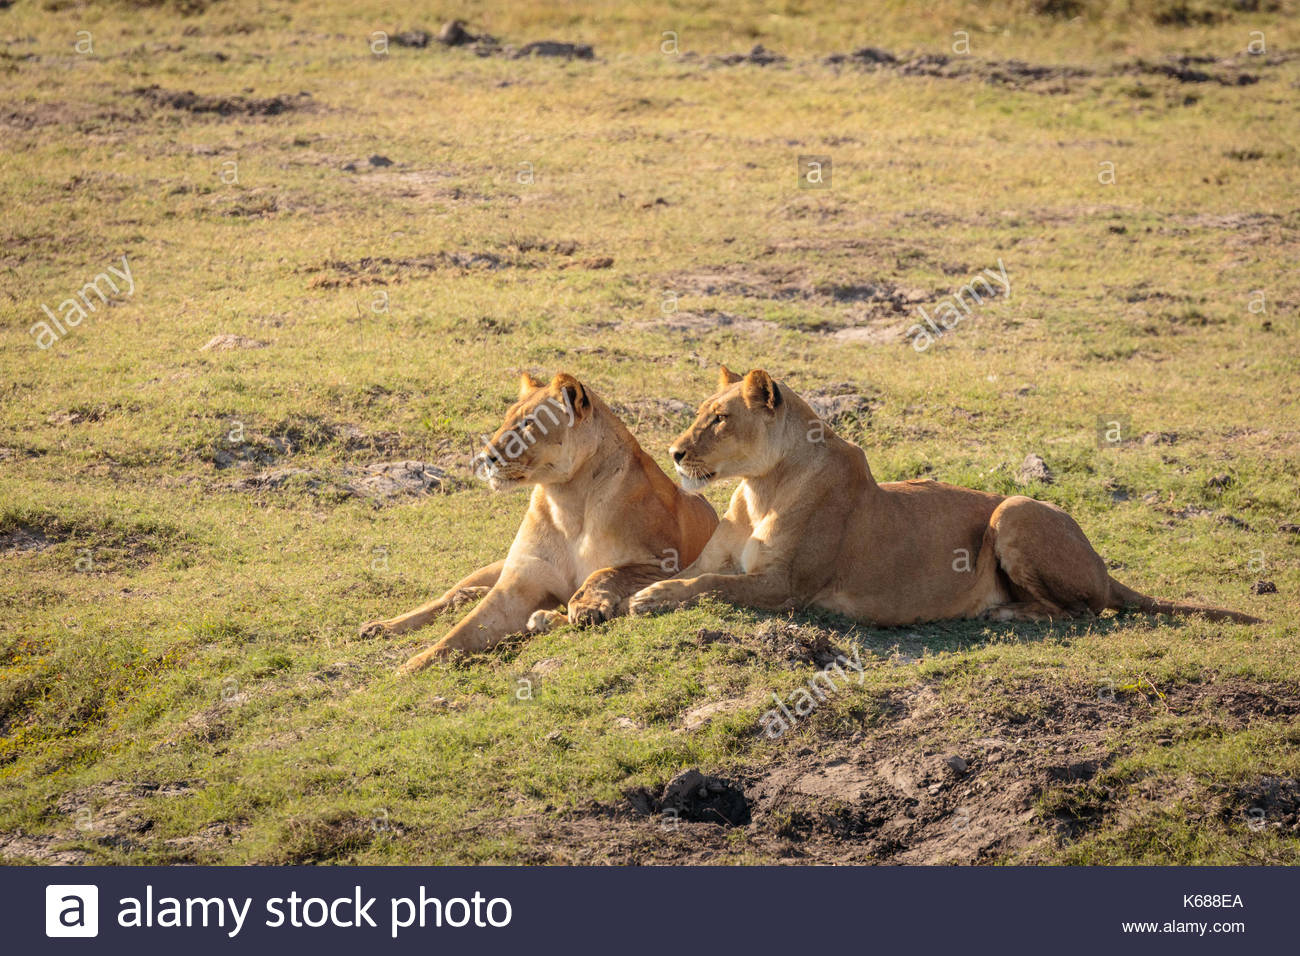 Lions in Chobe National Park taken on Safari in Botswana, Africa - Stock Image